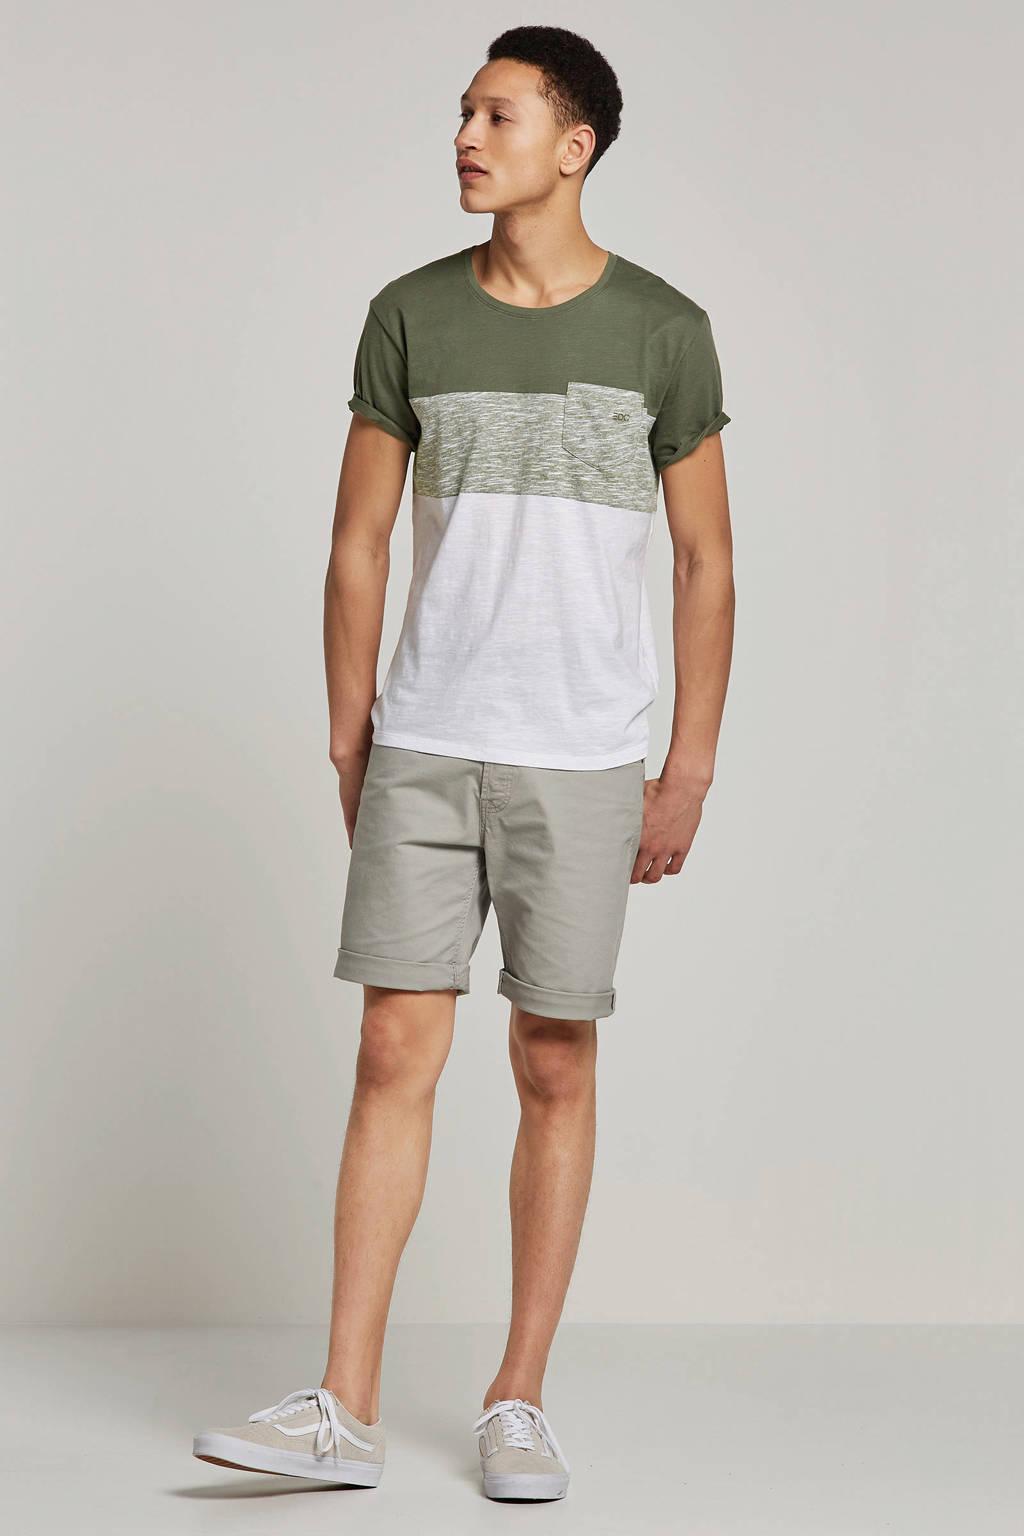 edc Men T-shirt, Groen/wit